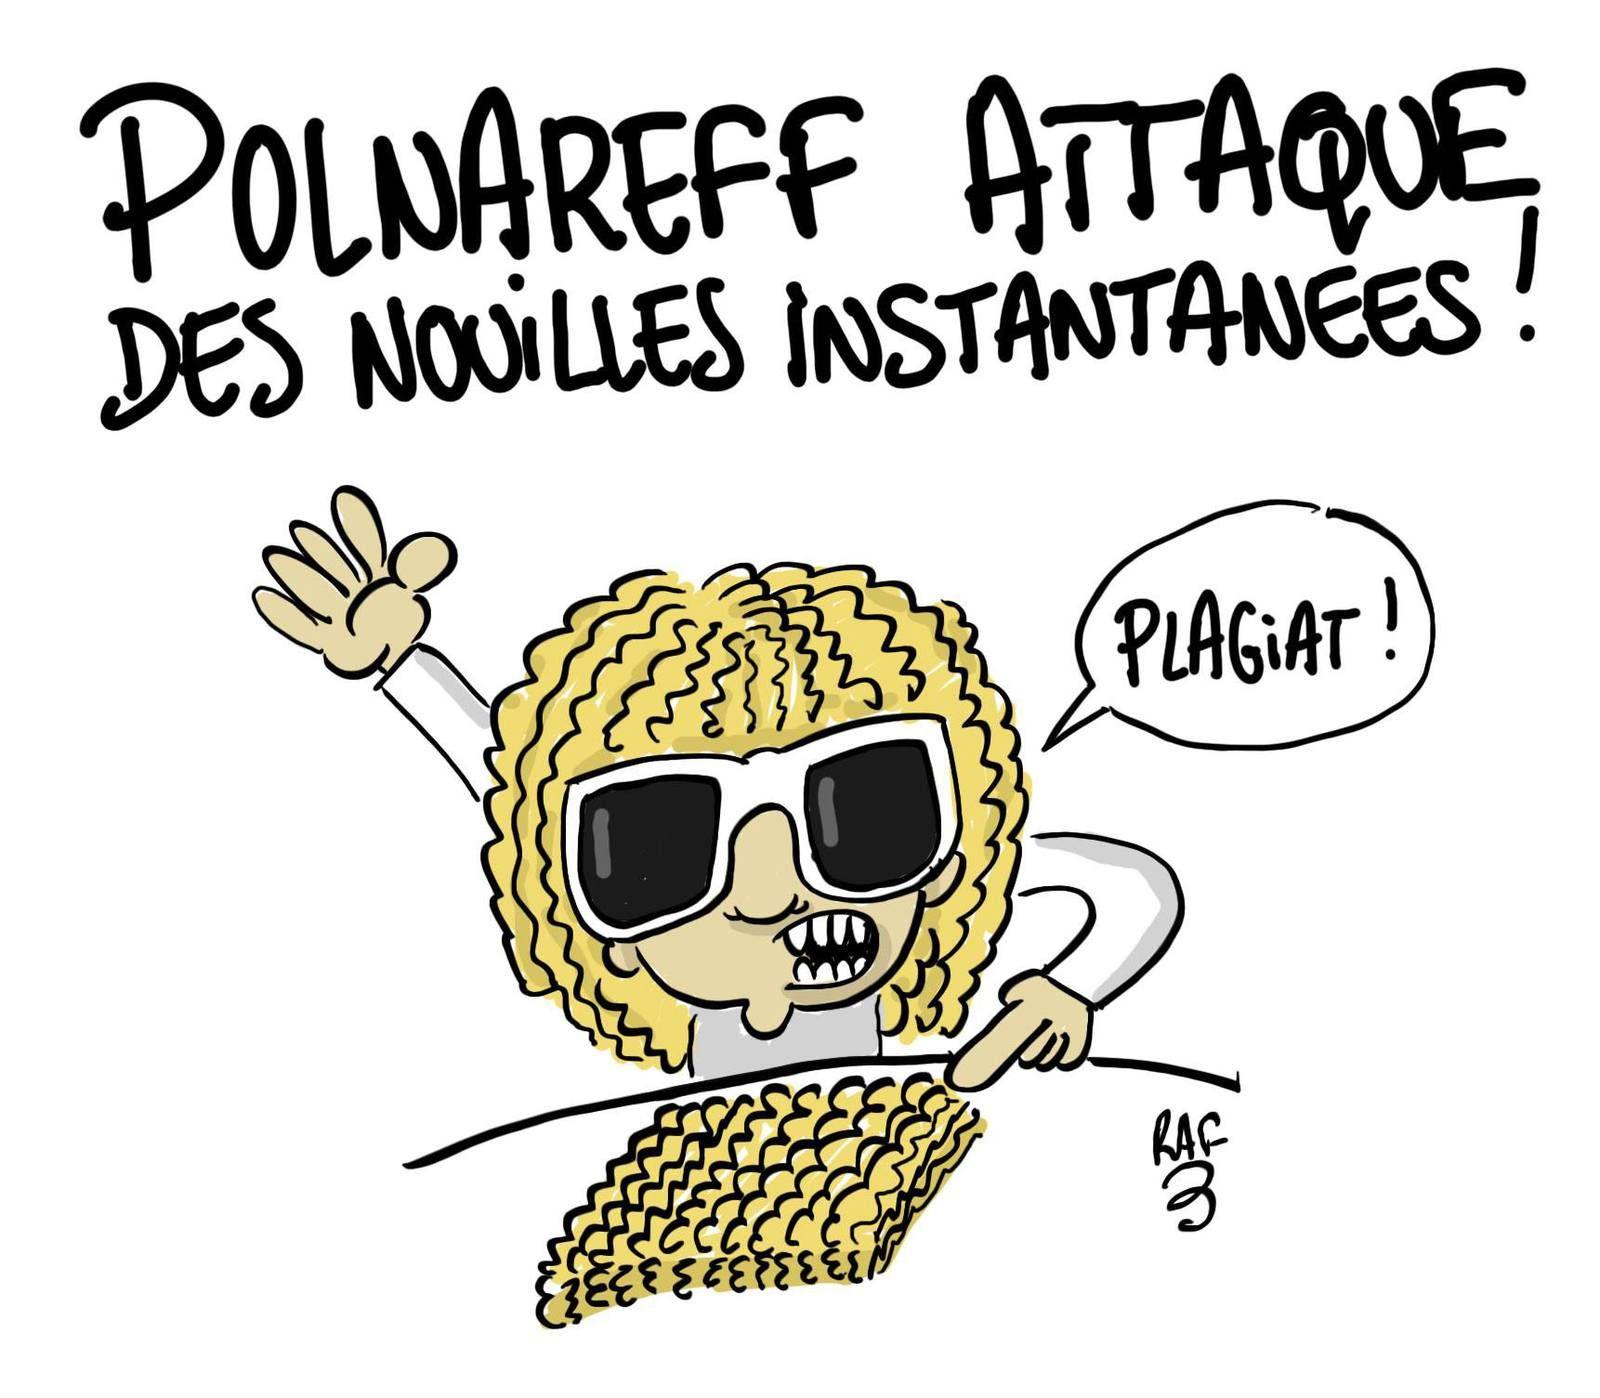 Polnareff attaque les nouilles instantanées